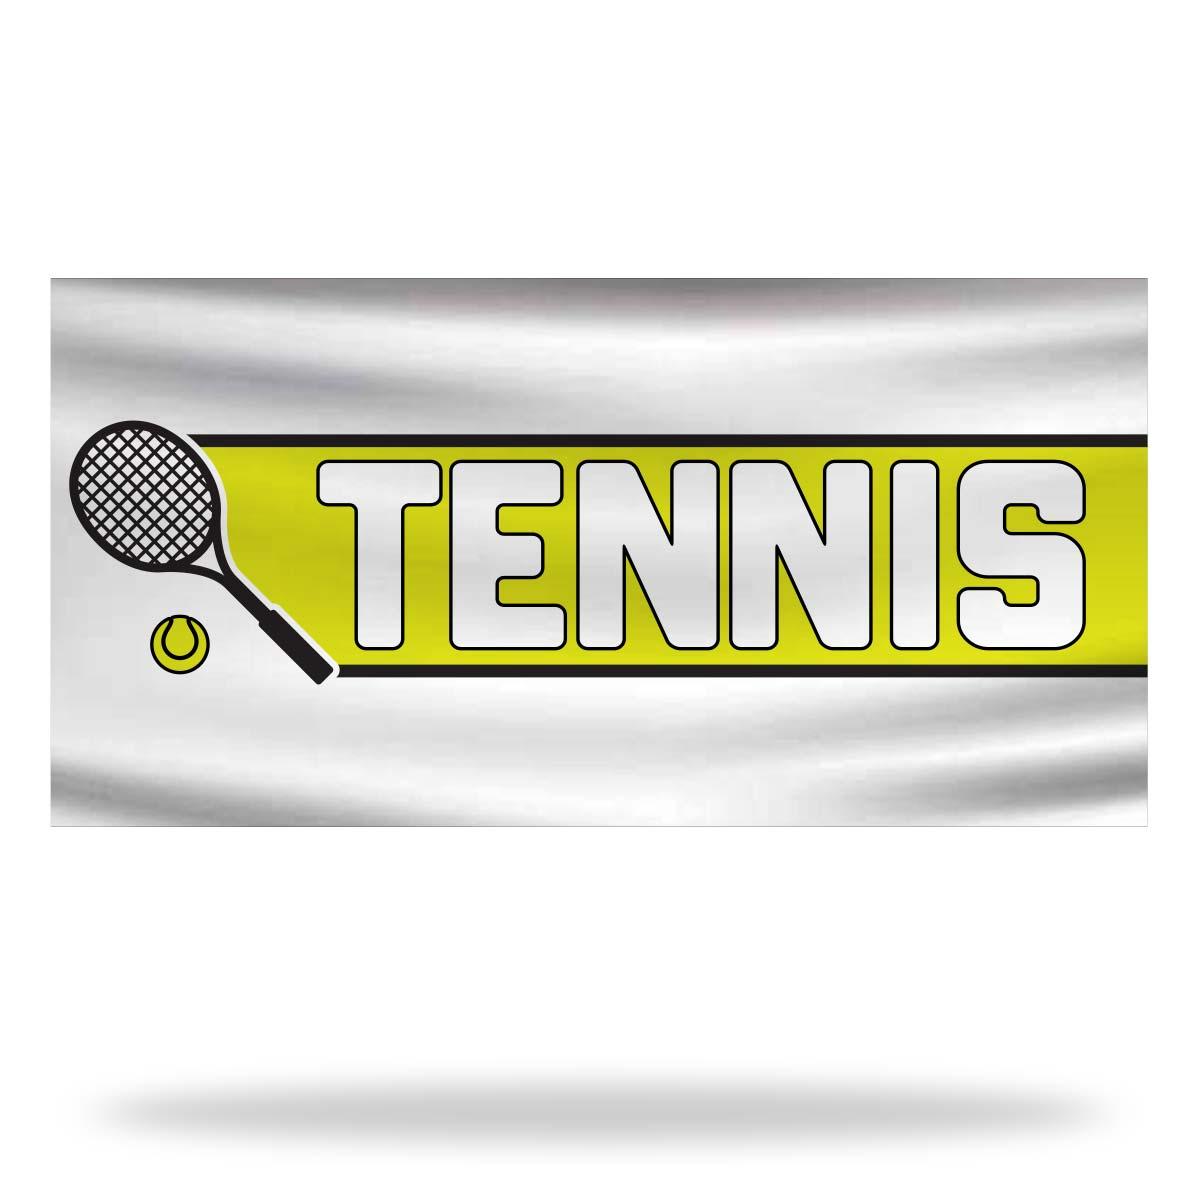 Tennis Flags & Banners Design 03